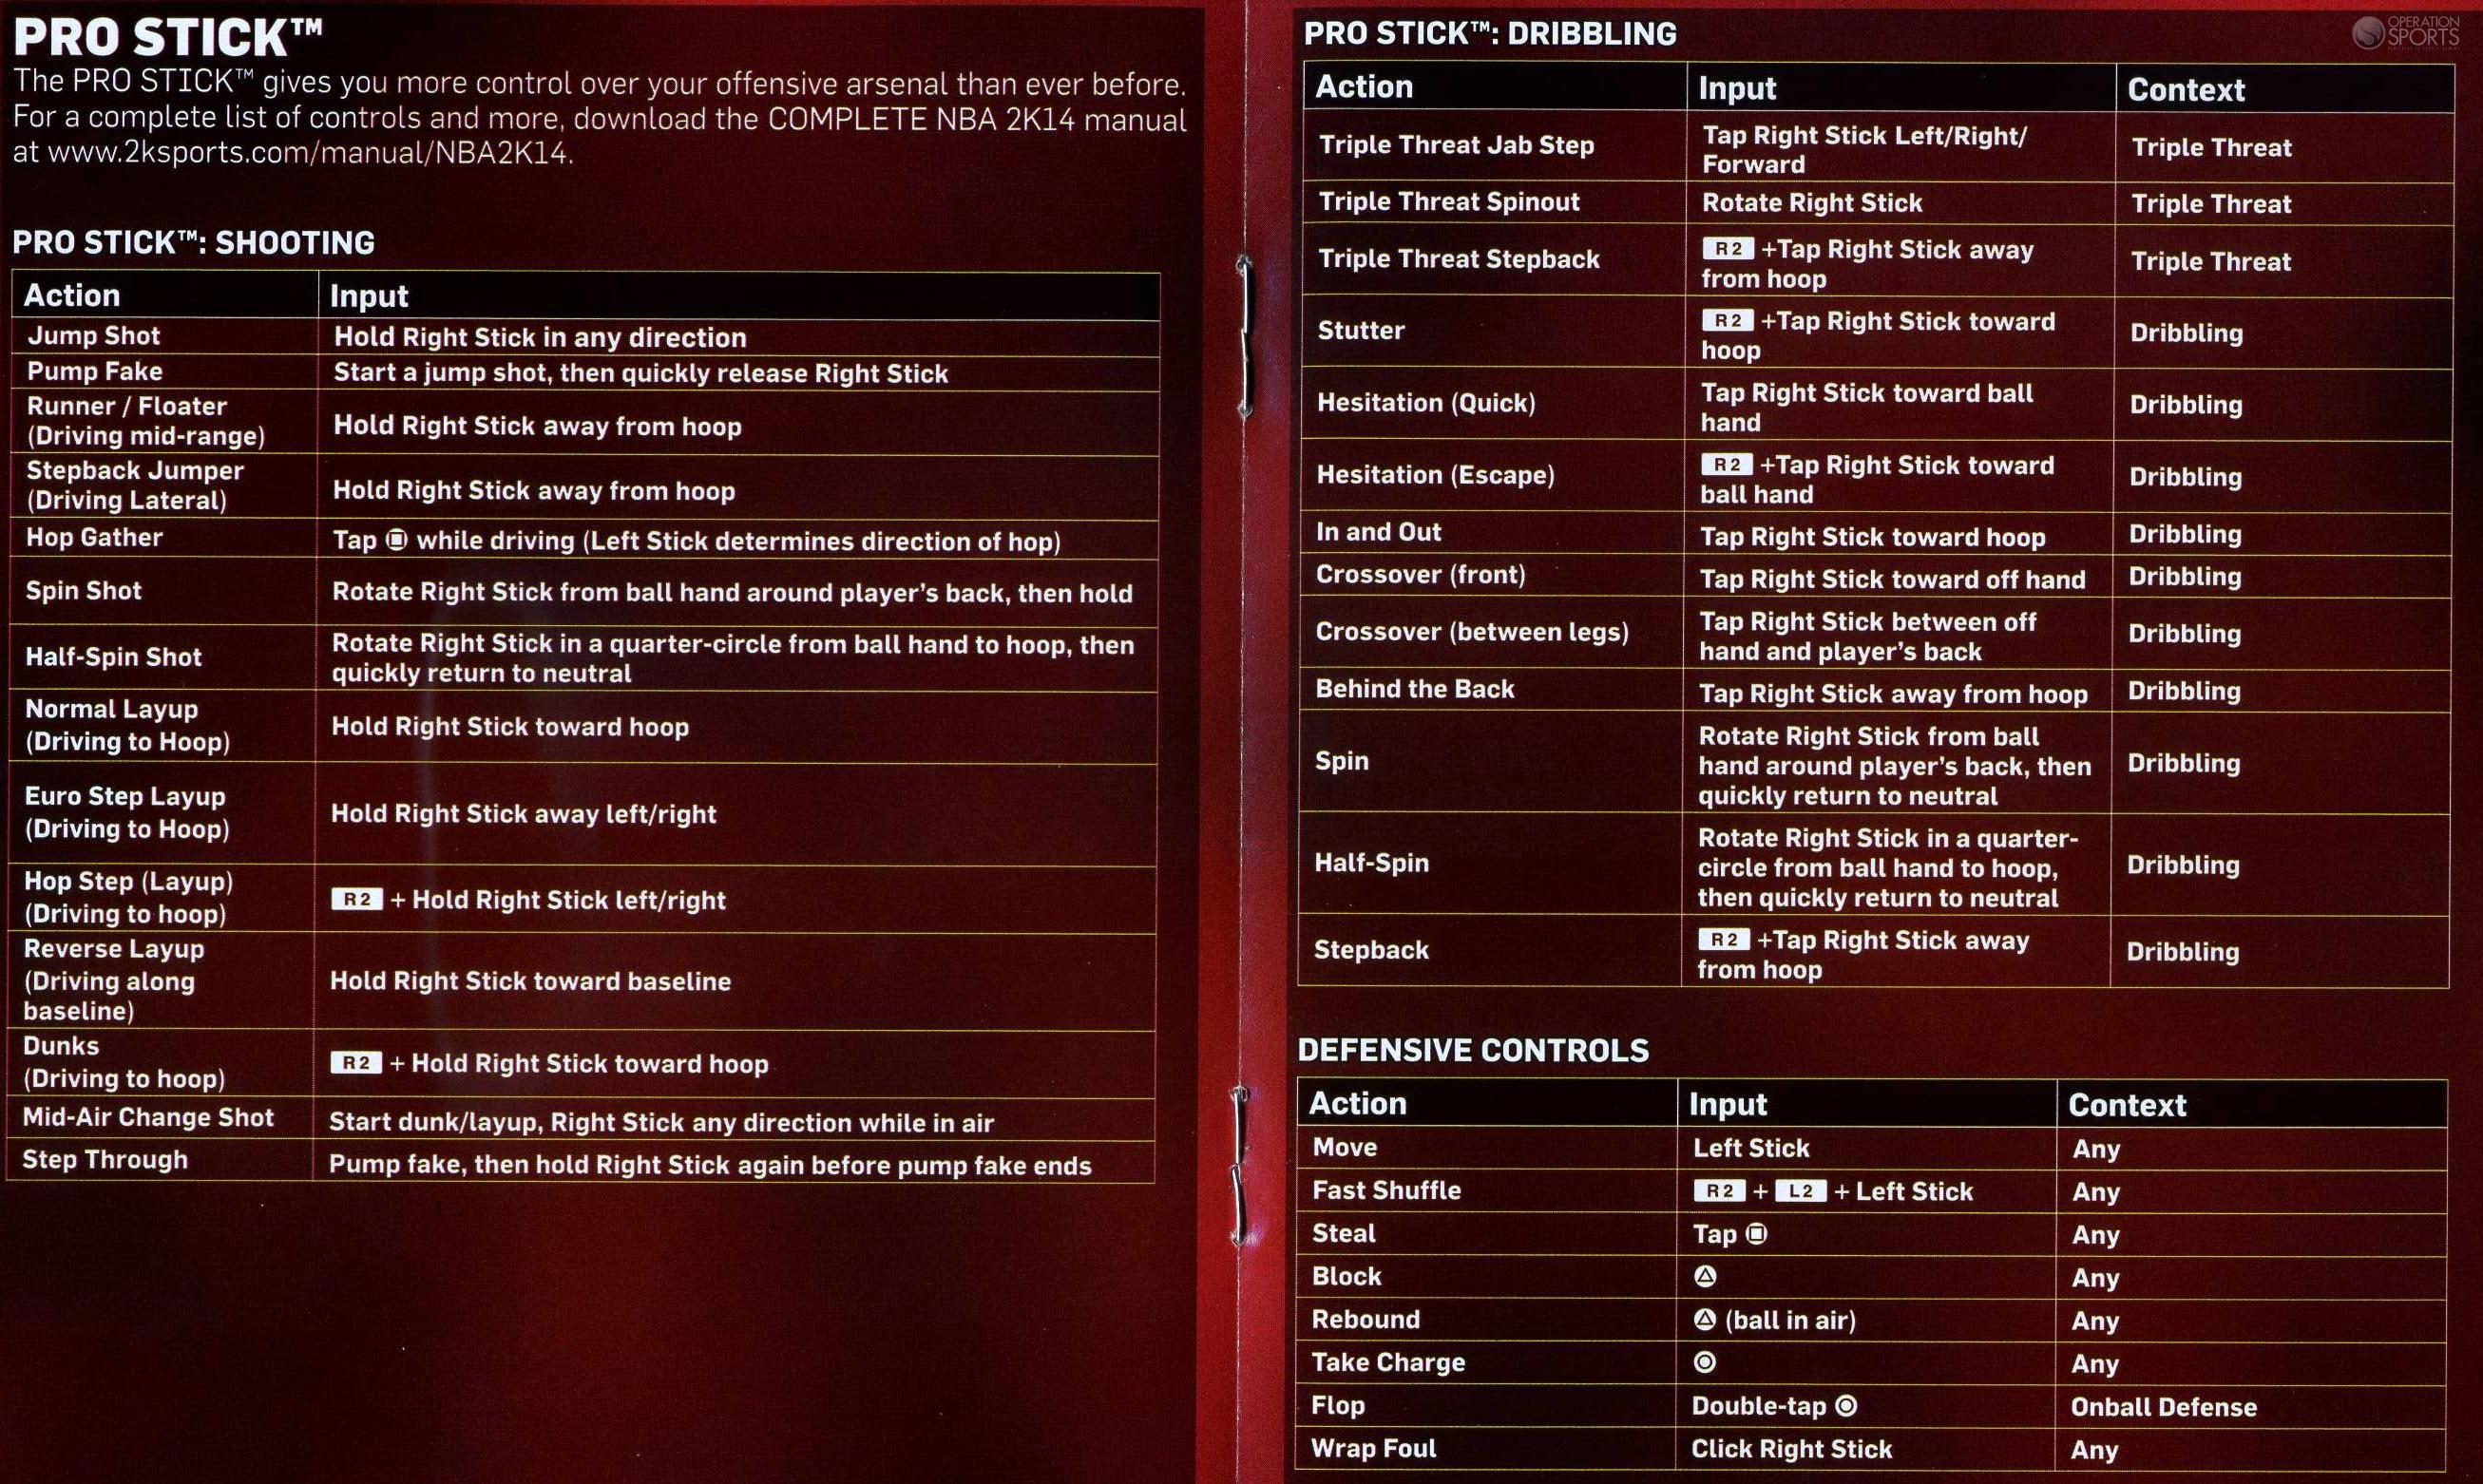 NBA 2K14 Advanced Controls - Operation Sports